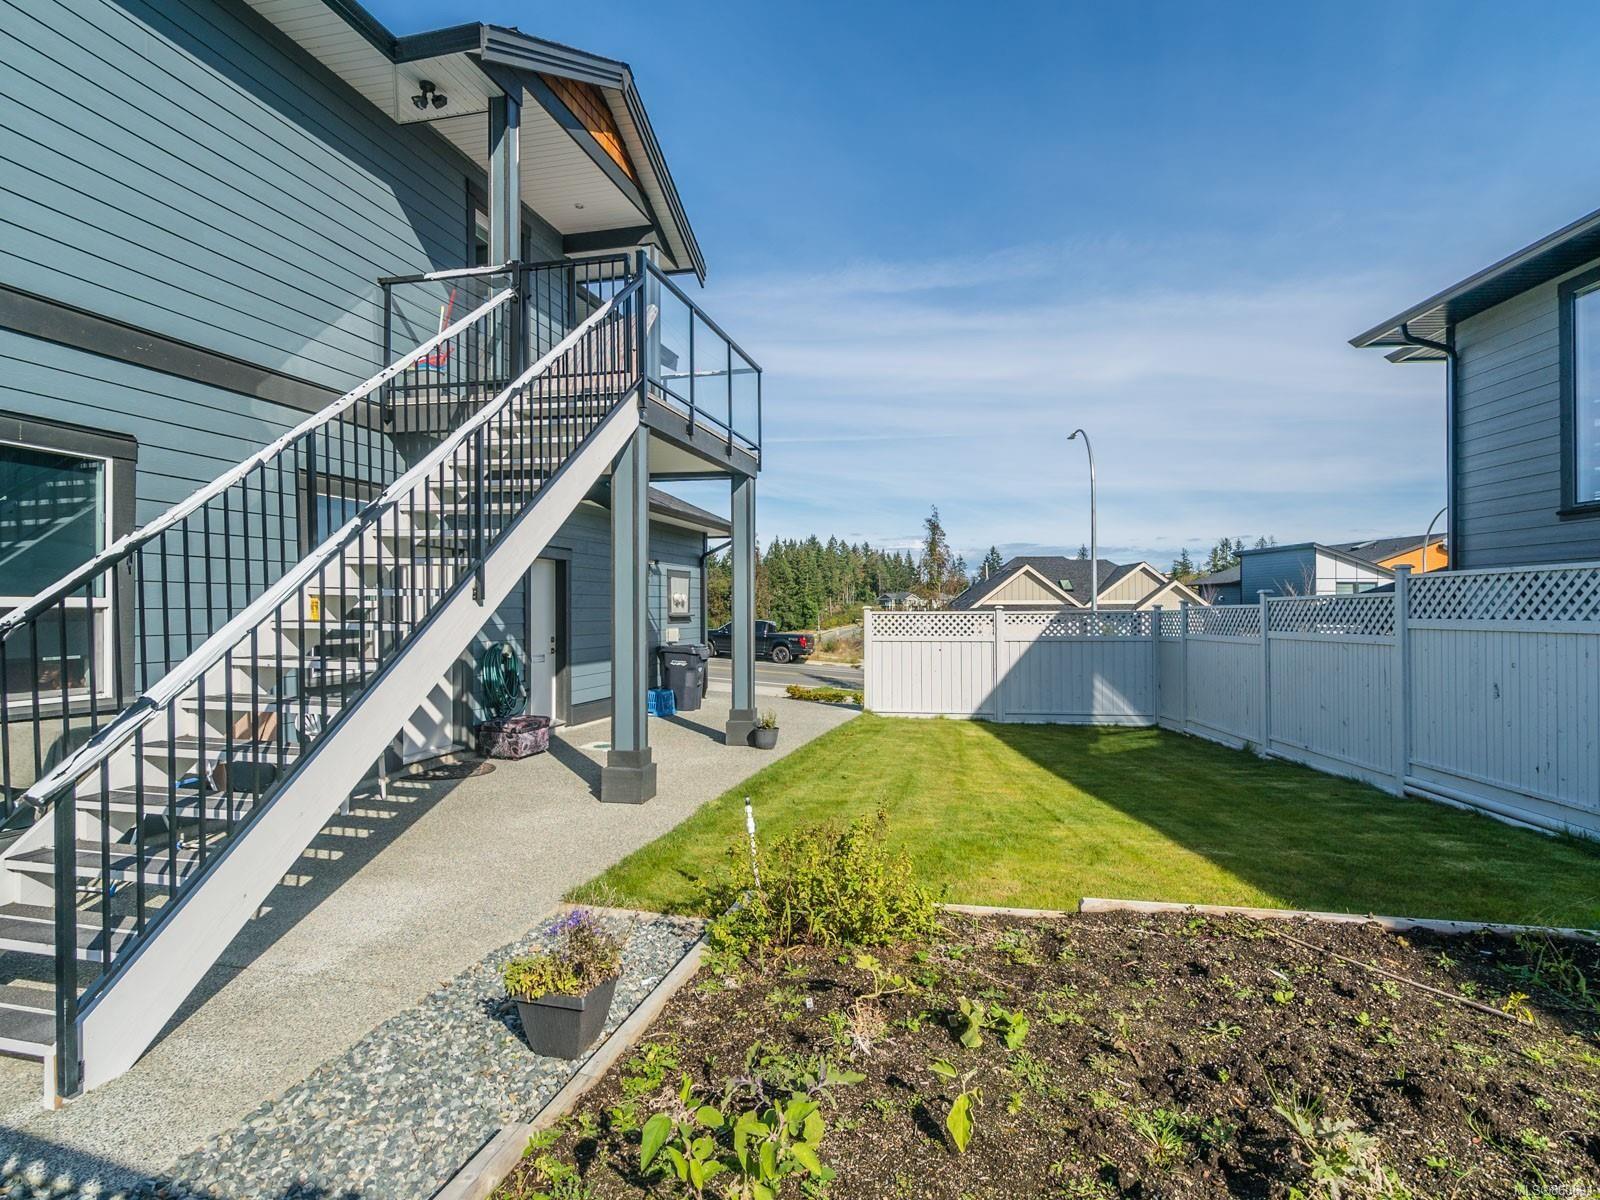 Photo 54: Photos: 5821 Linley Valley Dr in : Na North Nanaimo House for sale (Nanaimo)  : MLS®# 860691